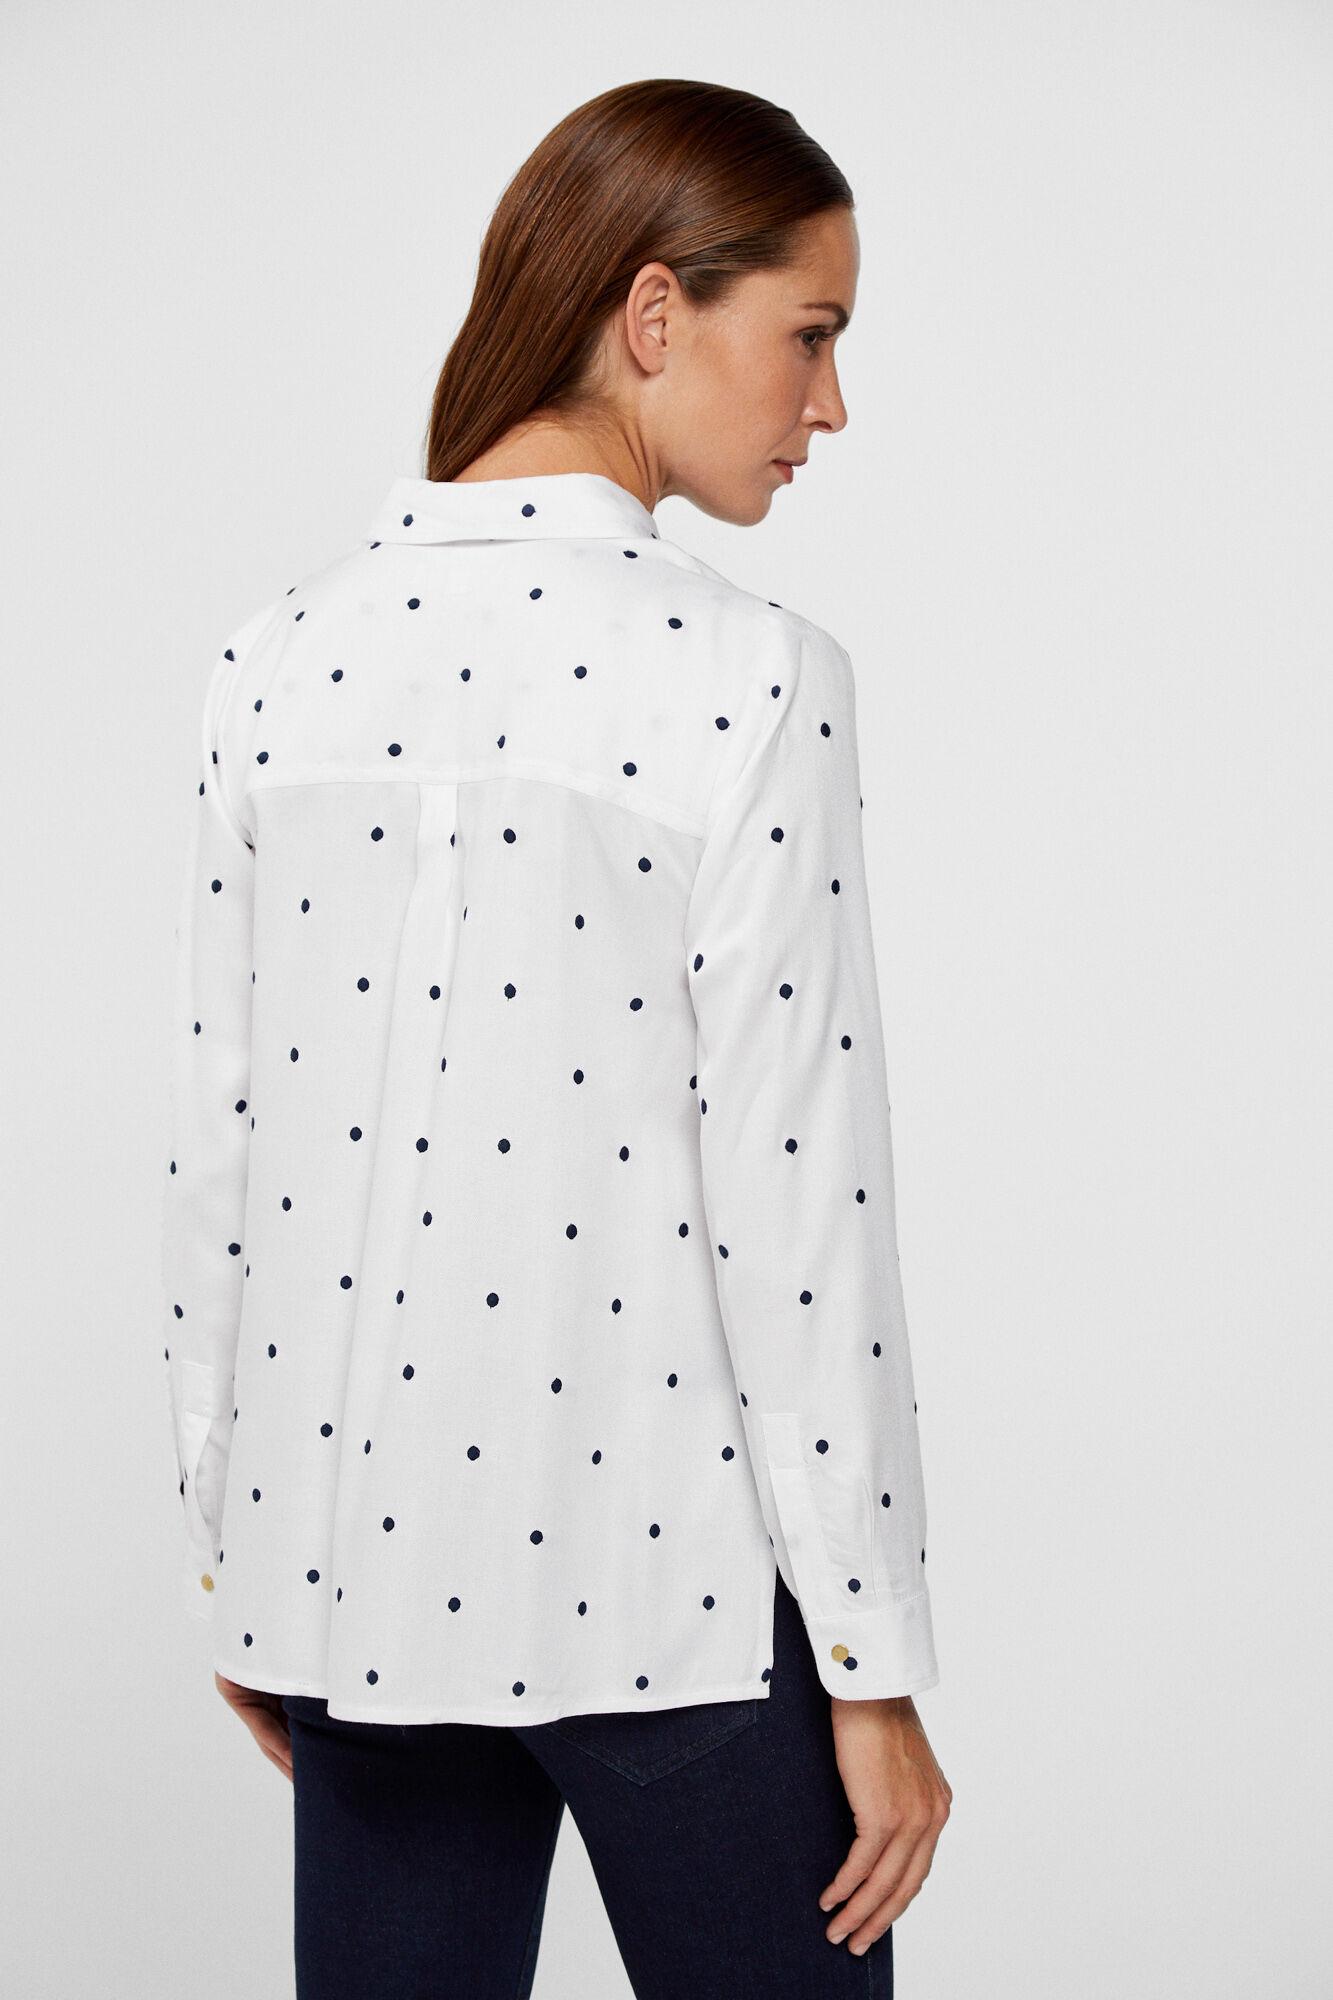 exquisite style purchase original meticulous dyeing processes Fluid viscose blouse   Blouses   Cortefiel Man & Woman